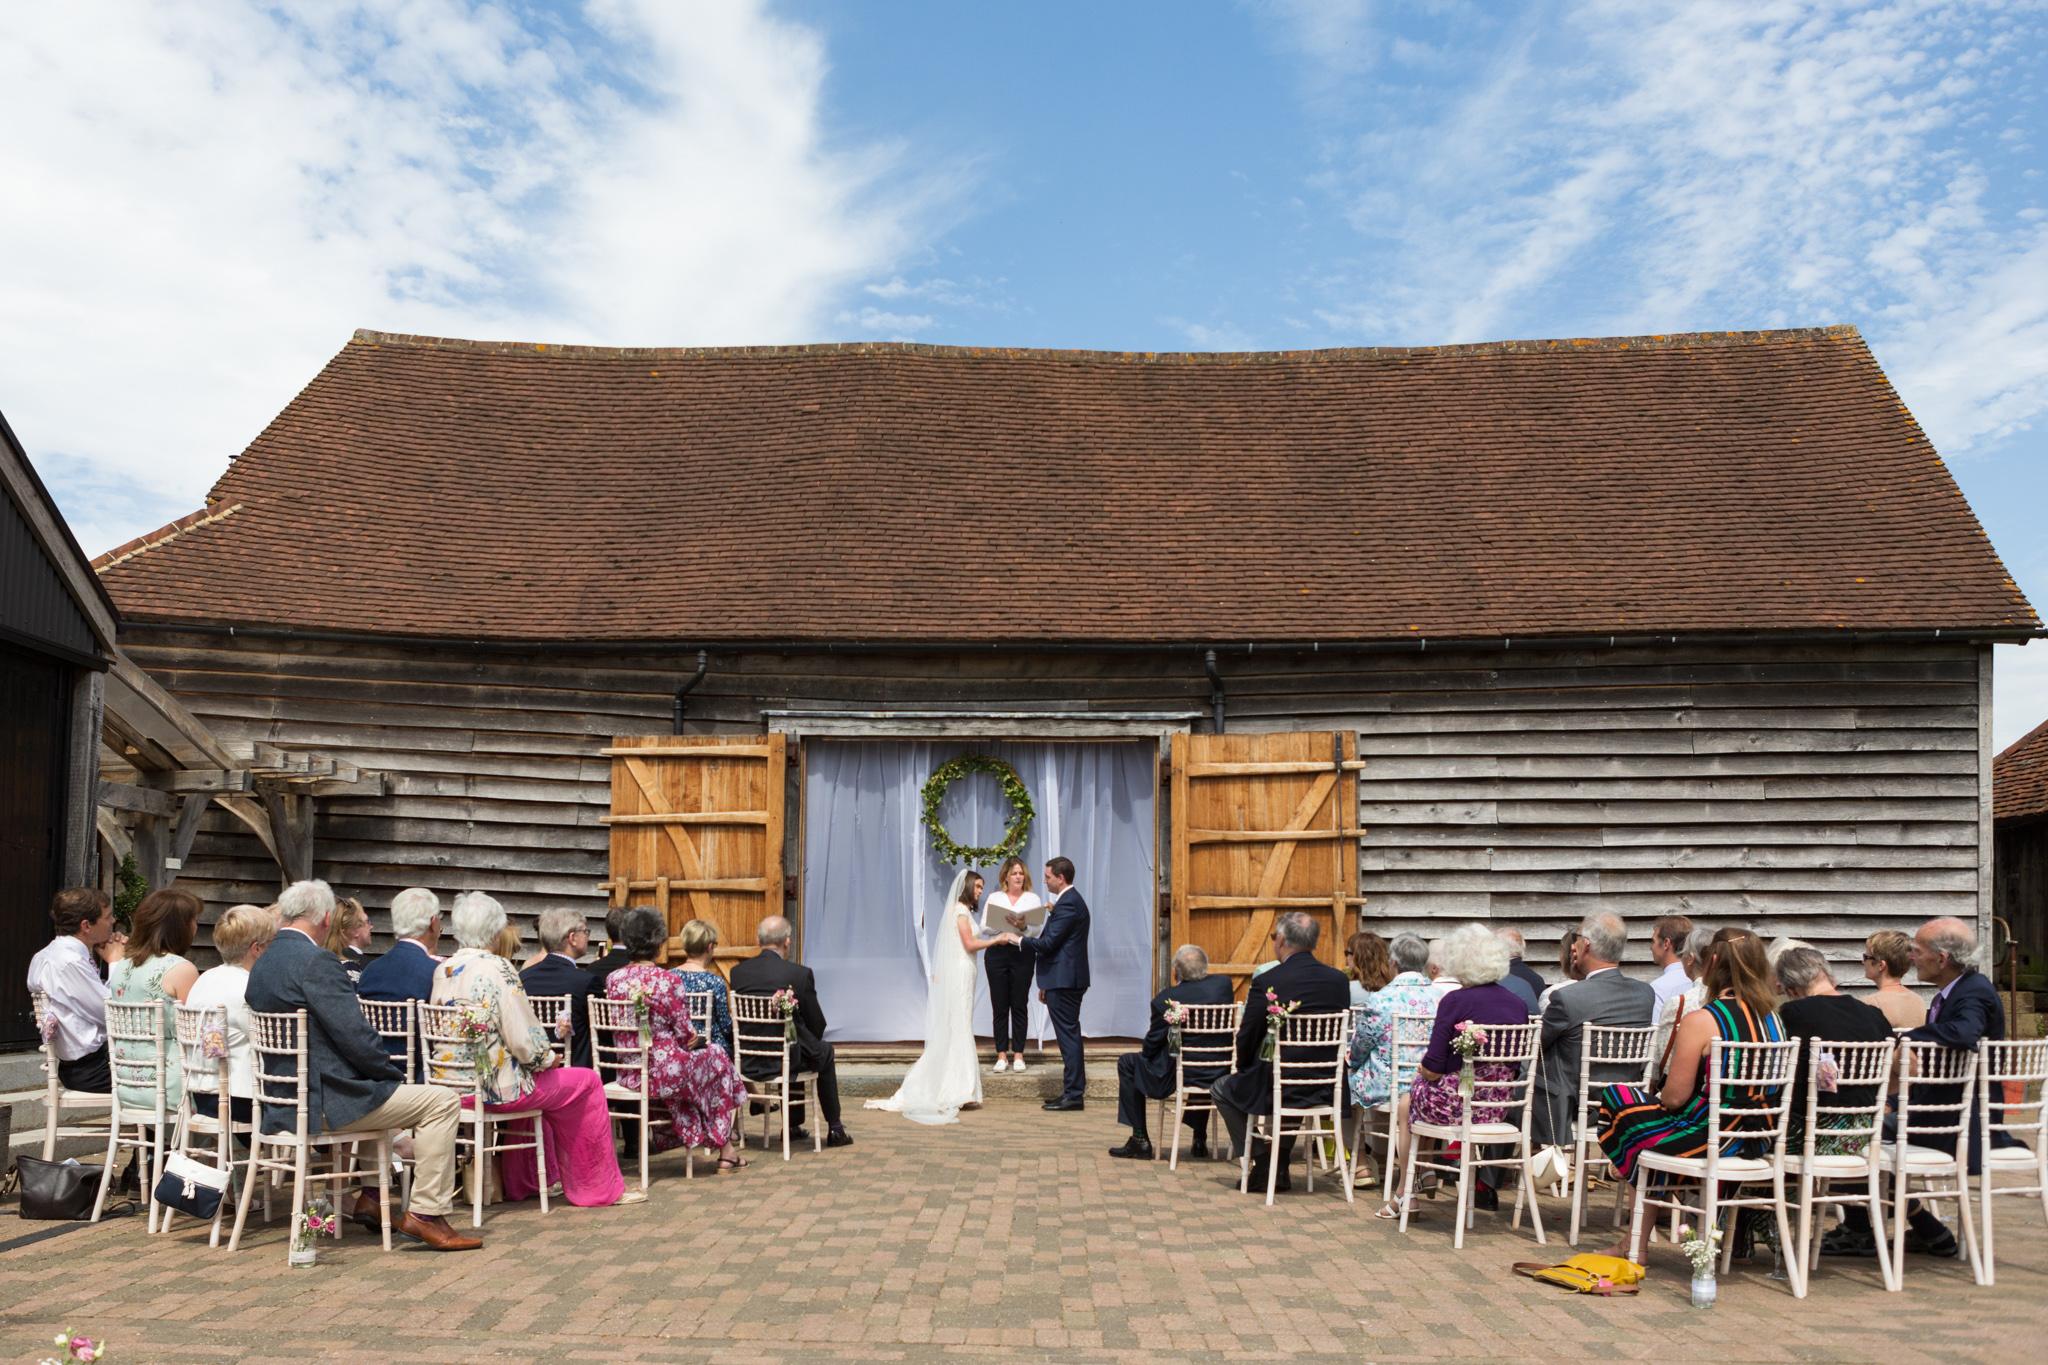 Wedding_Ceremony_Old_Greens_Barn_Newdigate_Surrey_Wedding_Photographer_Rachel_Thornhill_Photography